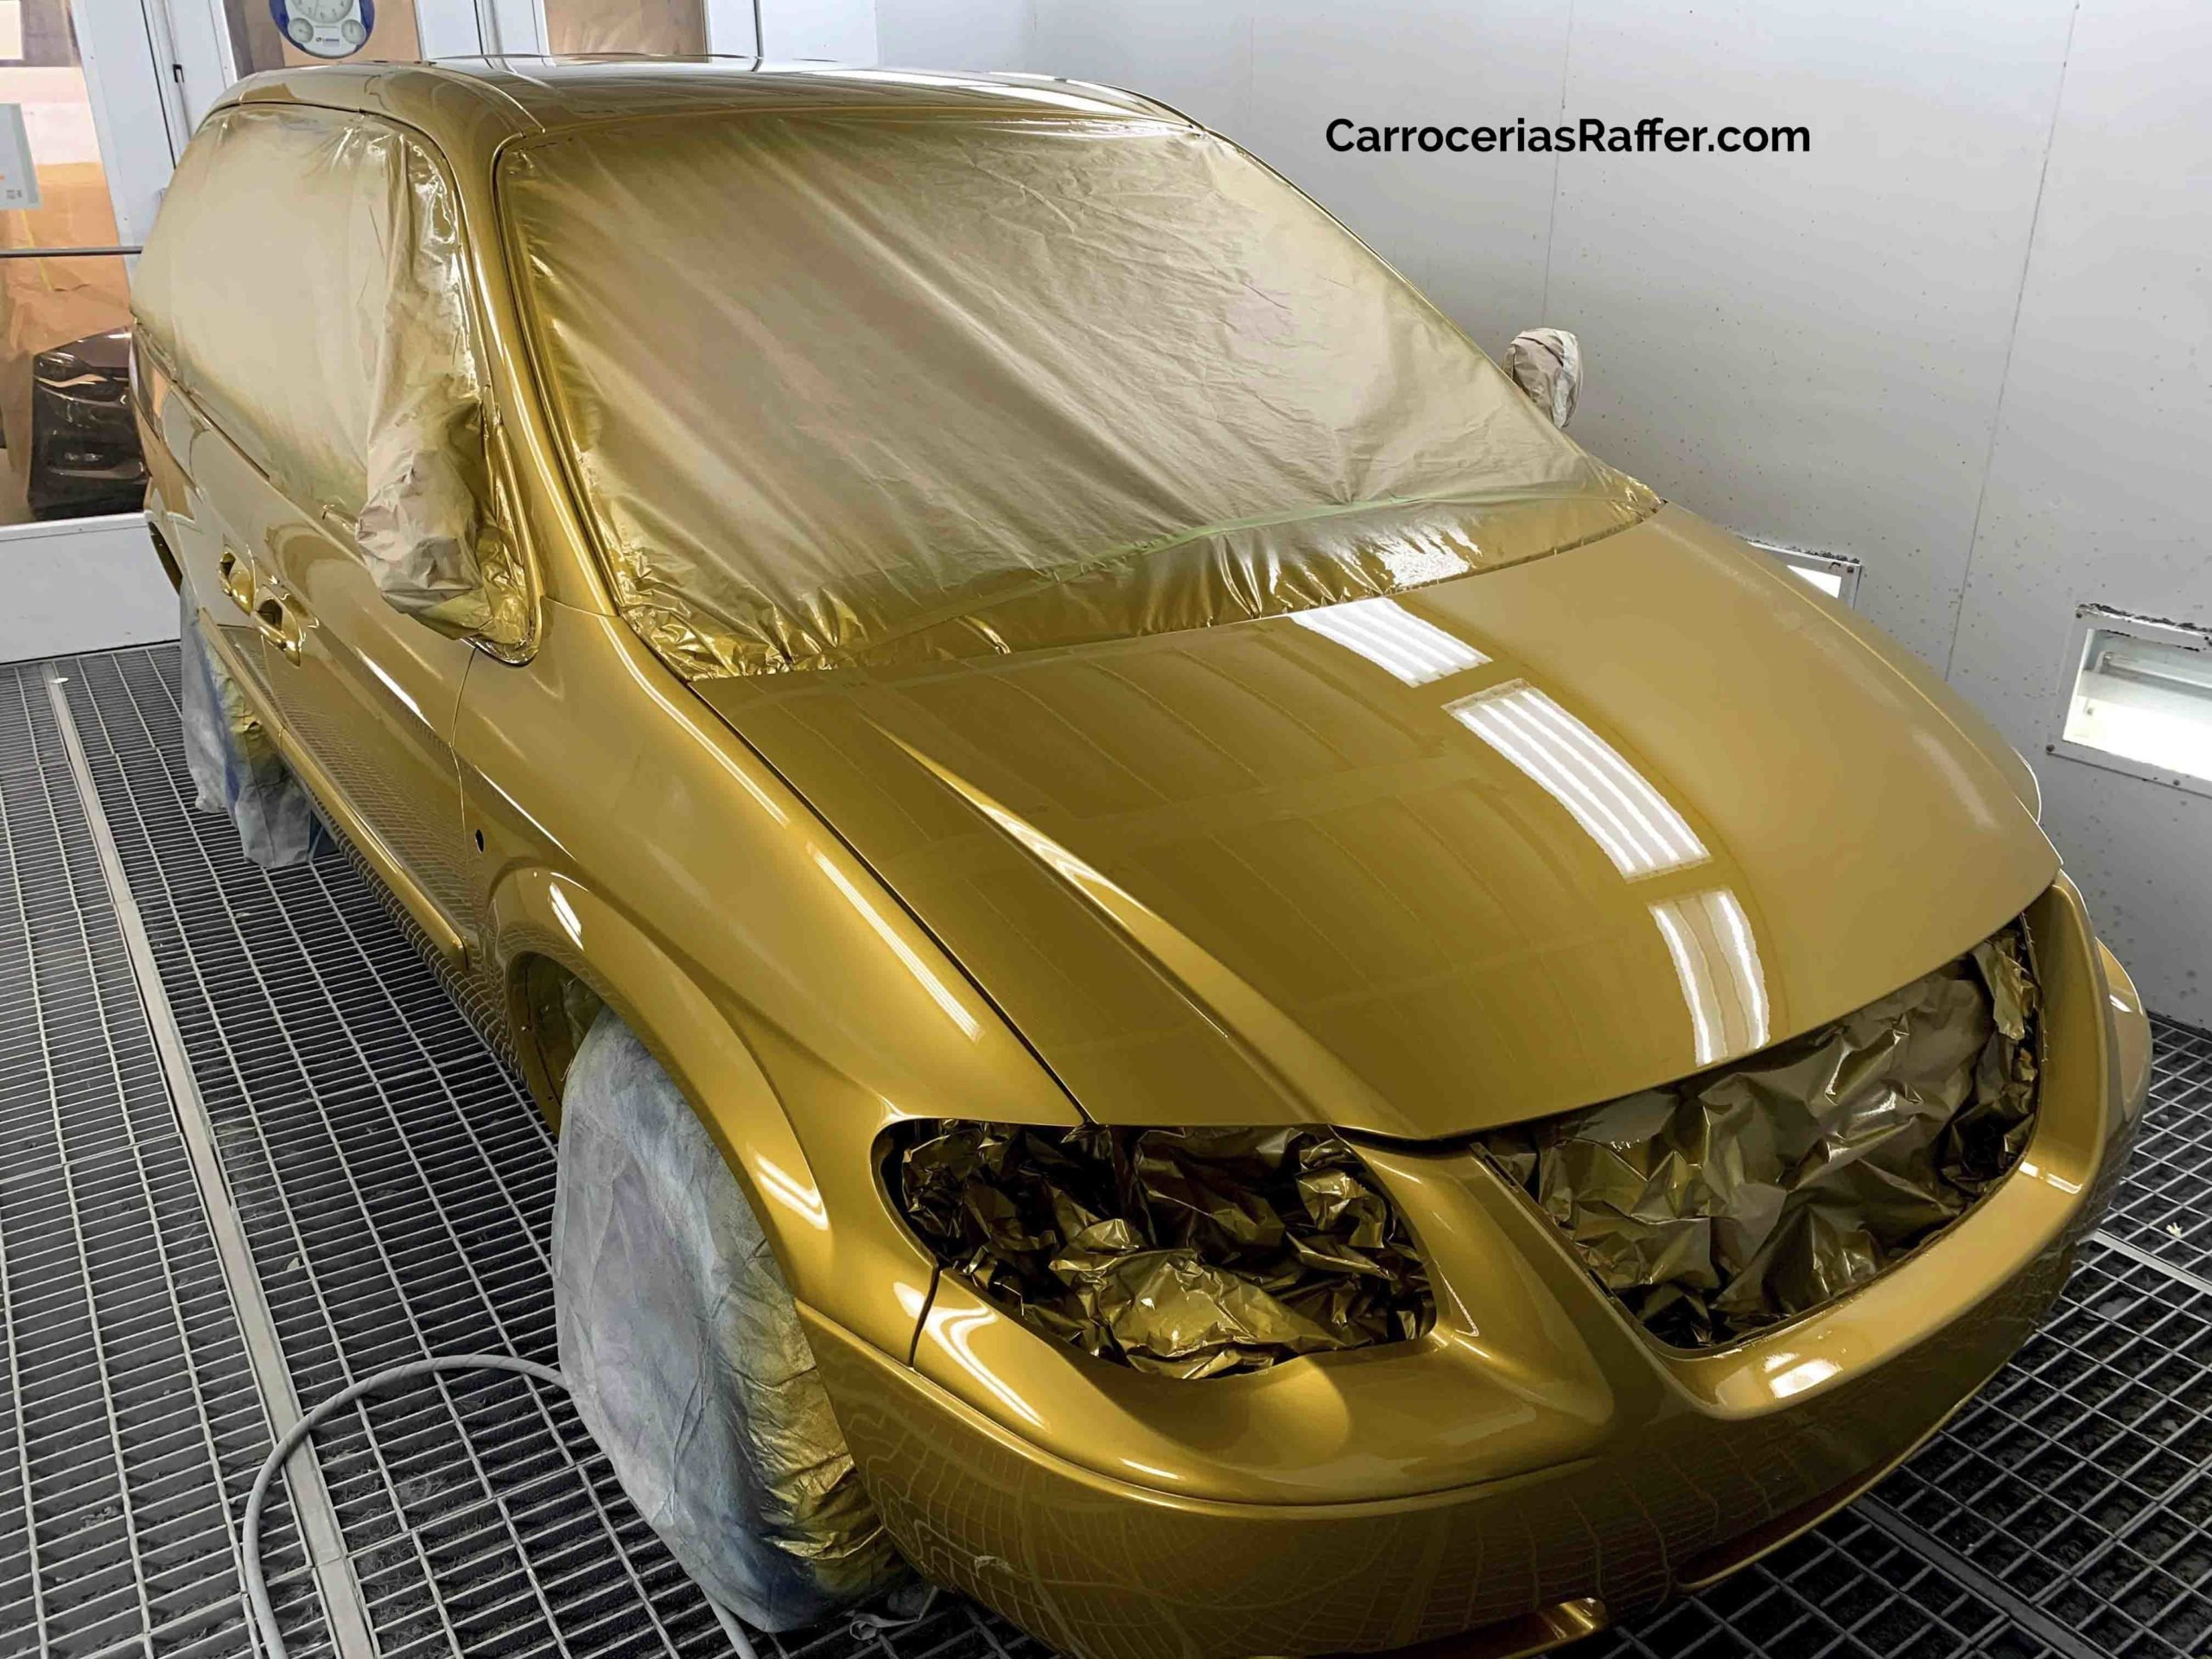 00010 chrysler voyager amarillo curcuma carrocerias raffer pintar furgoneta hernani gipuzkoa donostia san sebastian copia